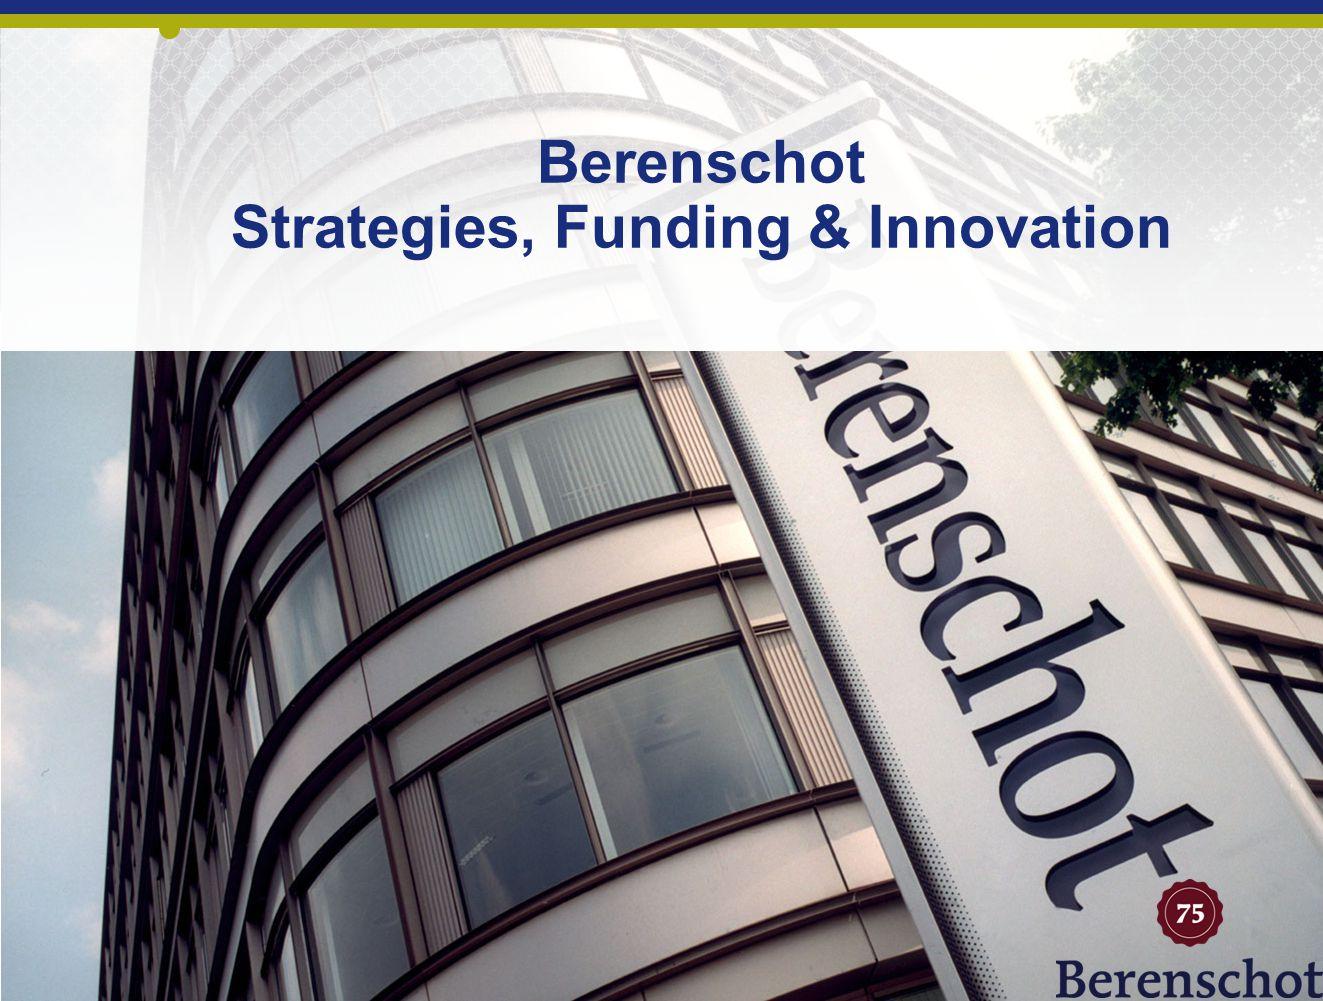 Berenschot Strategies, Funding & Innovation